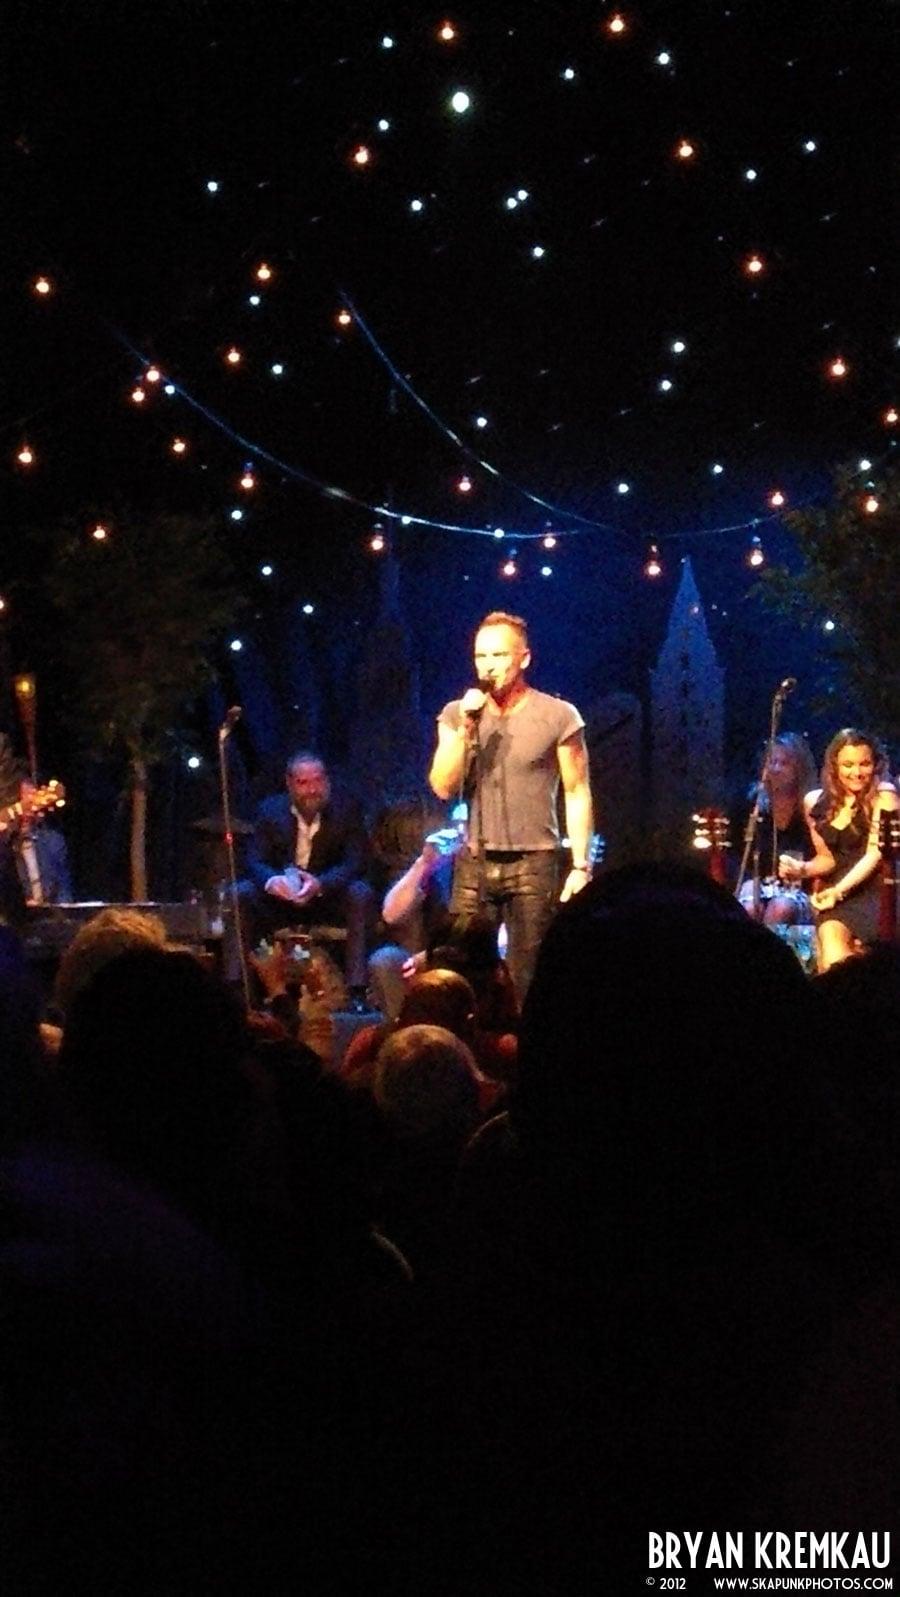 Russell Crowe, Alan Doyle, Samantha Barks, Scott Grimes, Kevin Durand, Size2Shoes at Gramercy Theatre, © 2012 - Bryan Kremkau